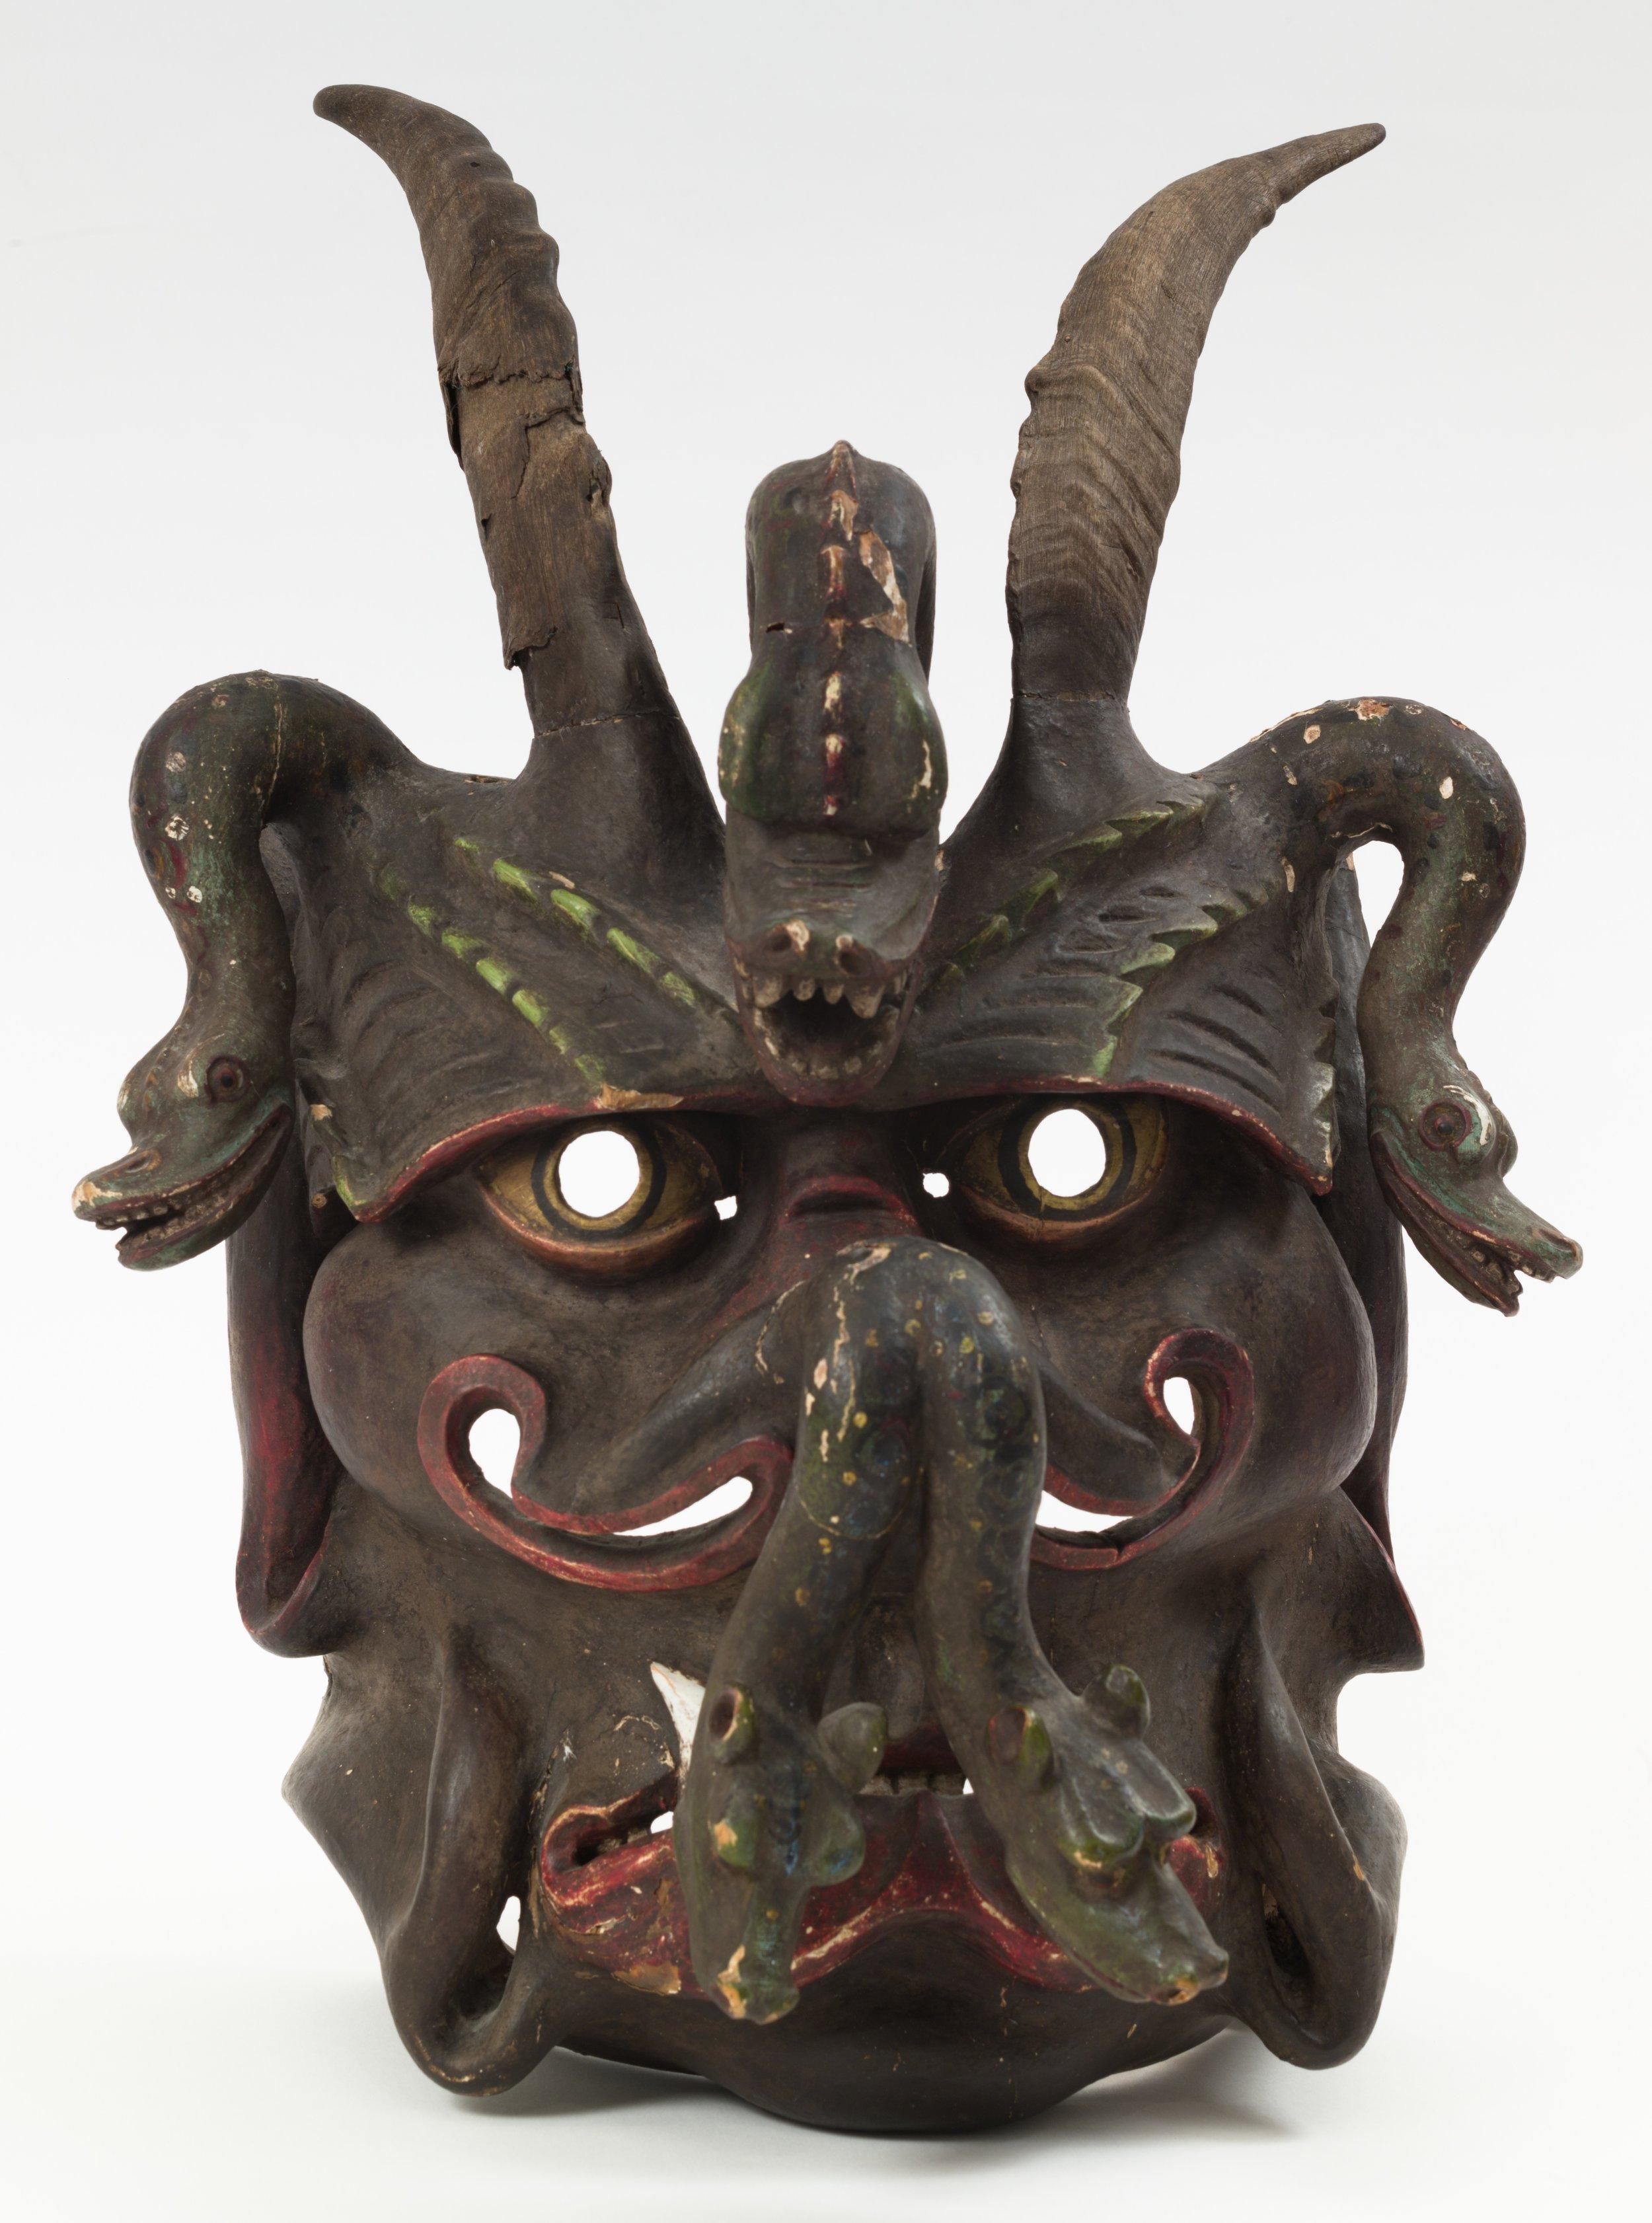 Viennese Mask-1-Oursler_Imponderable.jpg